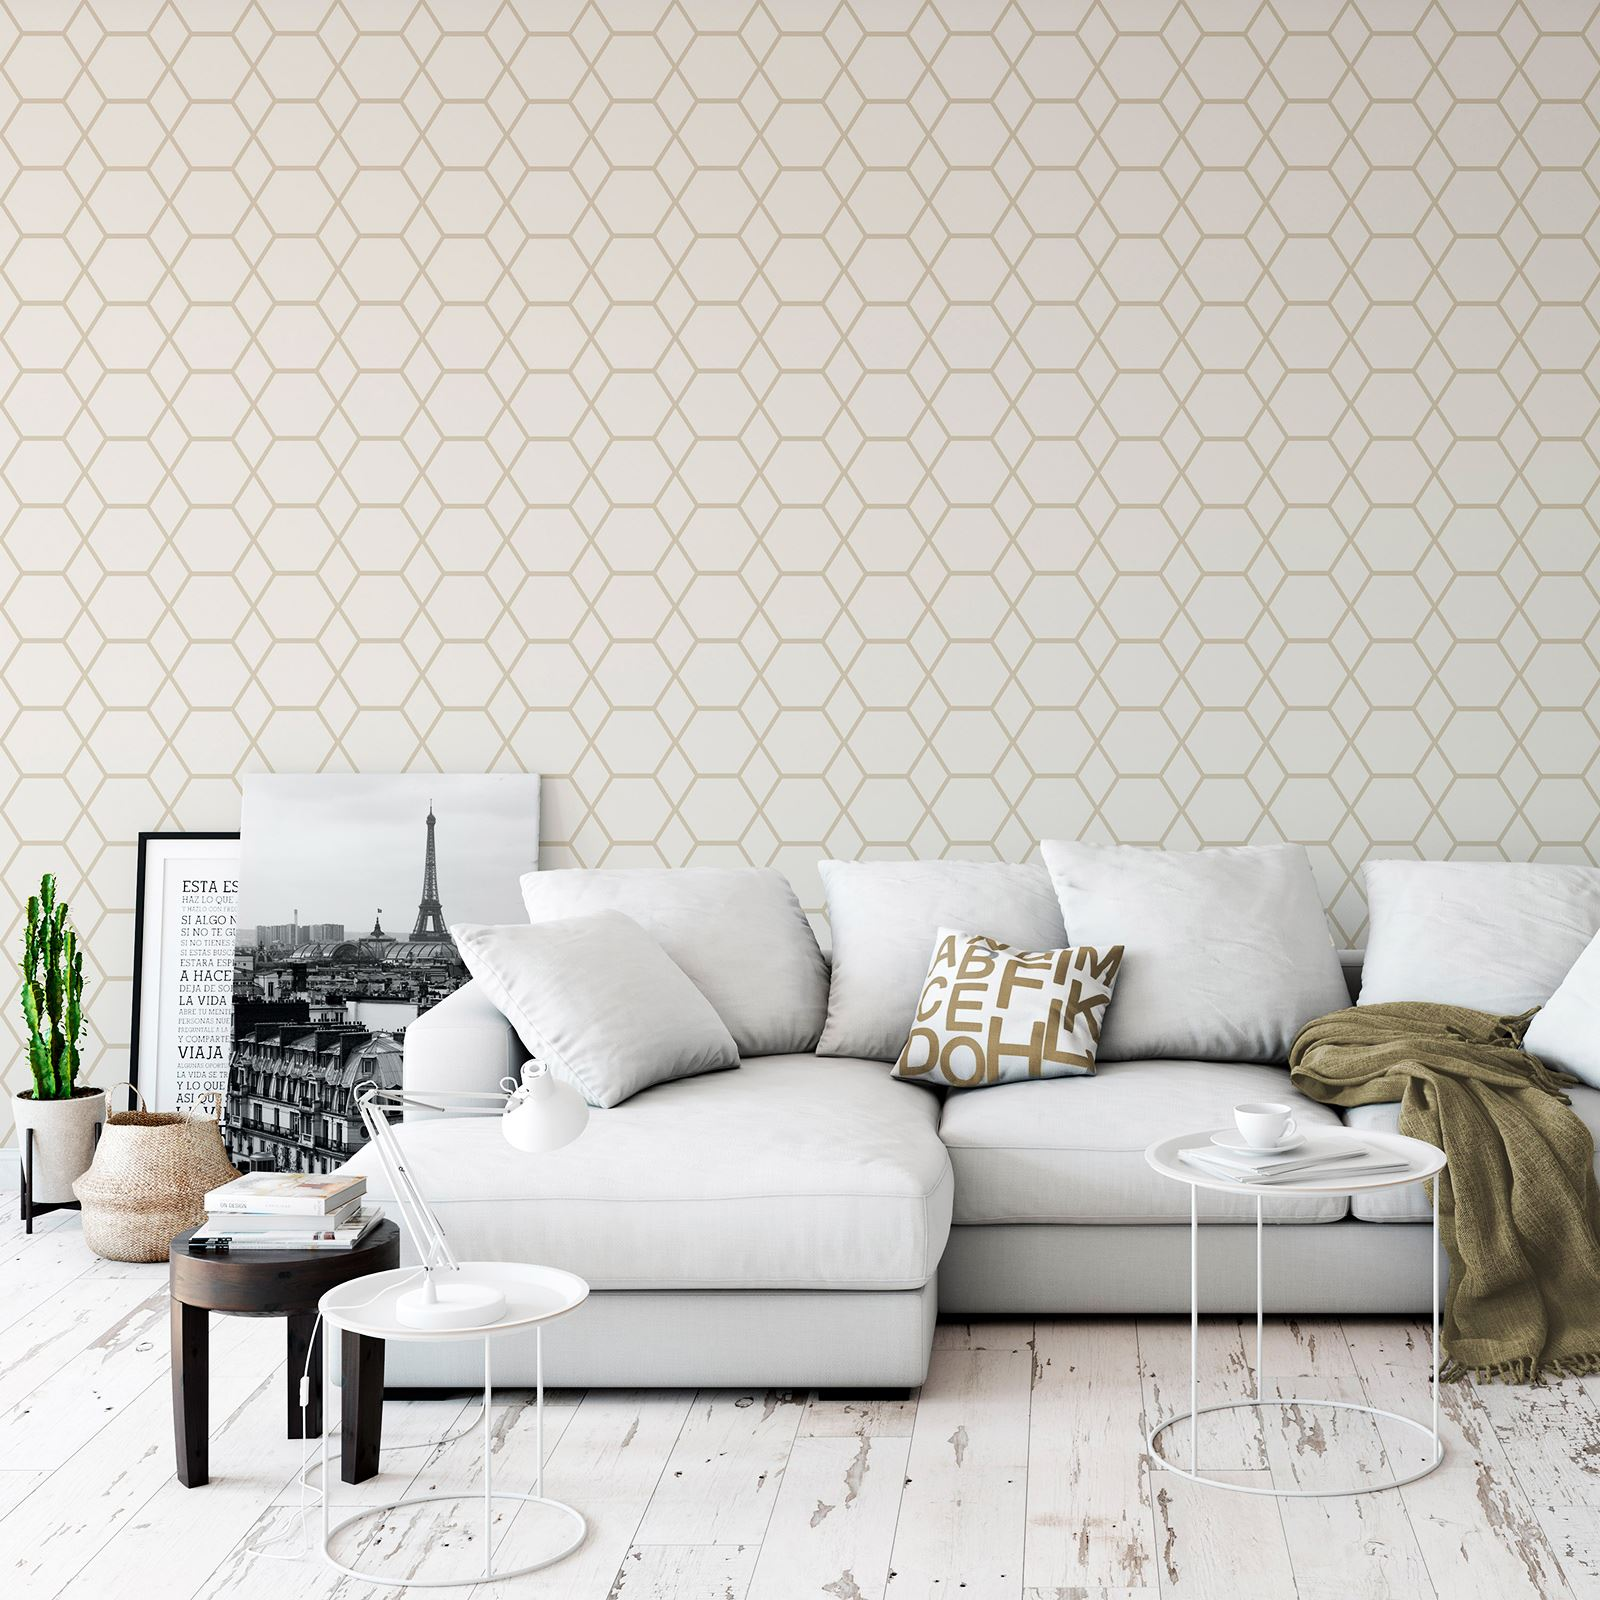 muriva rose gold tapete lipsy pailletten metallisch funkelnder glitzer ebay. Black Bedroom Furniture Sets. Home Design Ideas